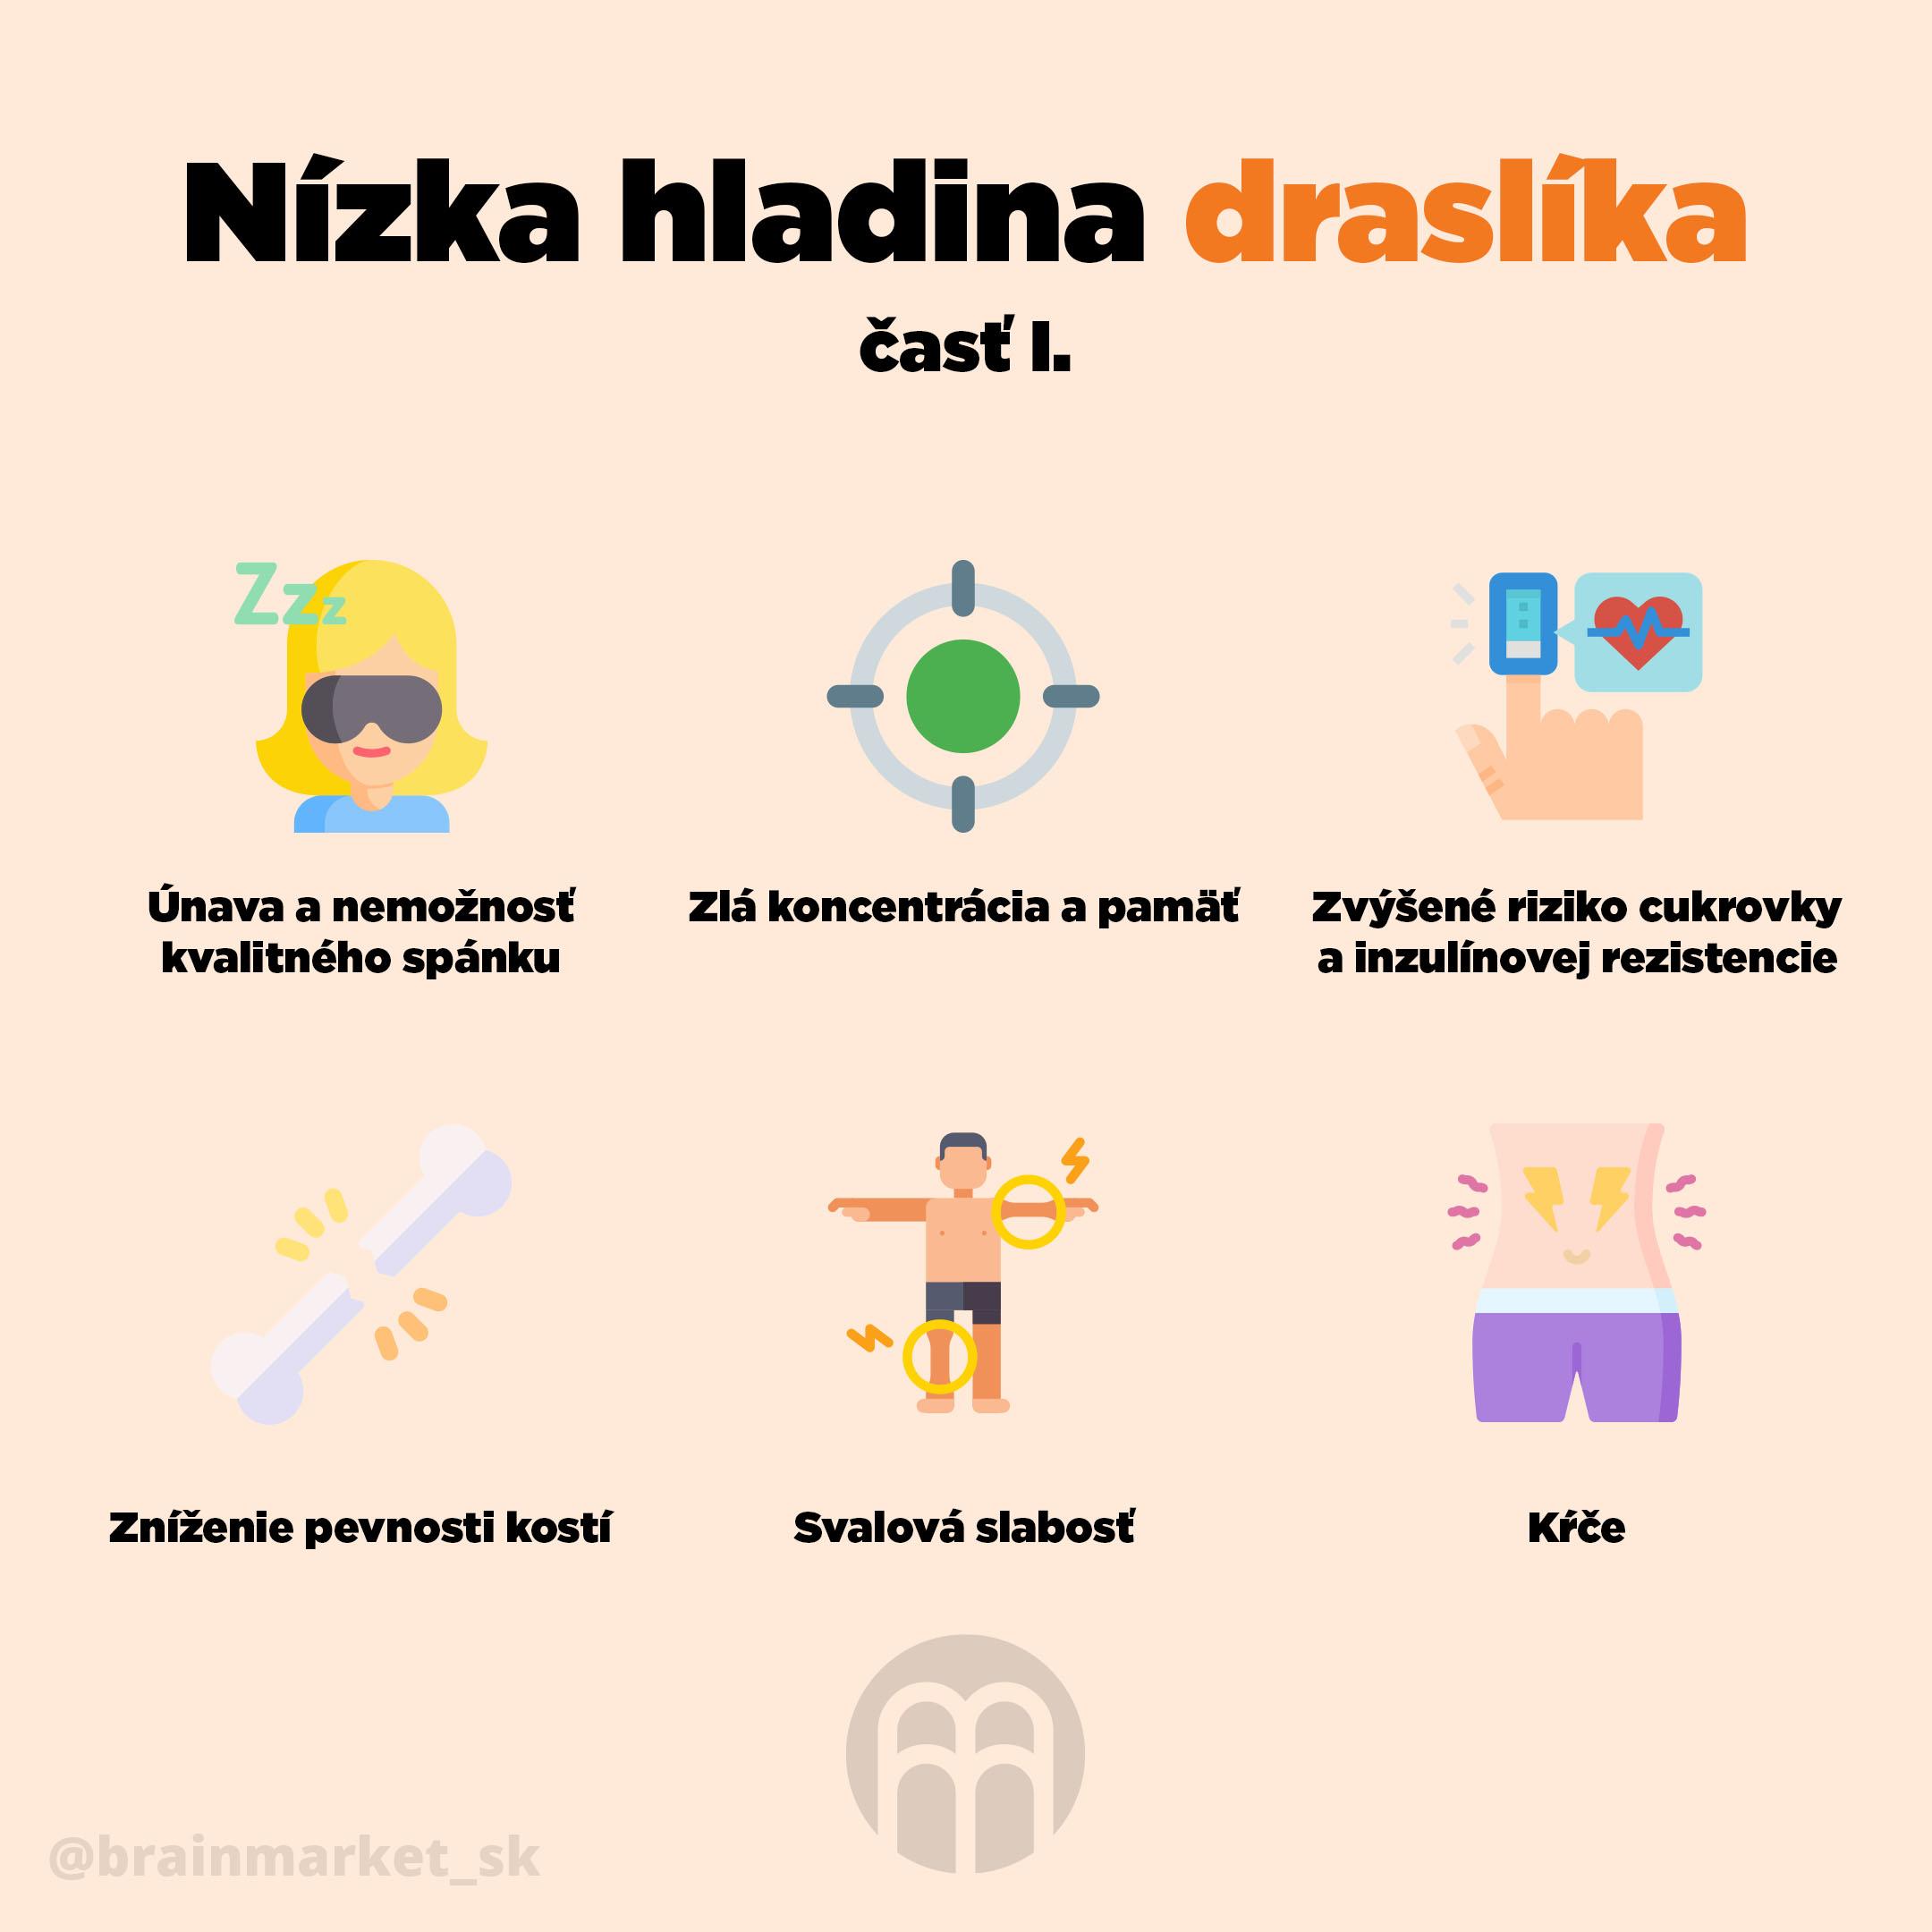 nizka_hladina_draslika_infografika_brainmarket_SK